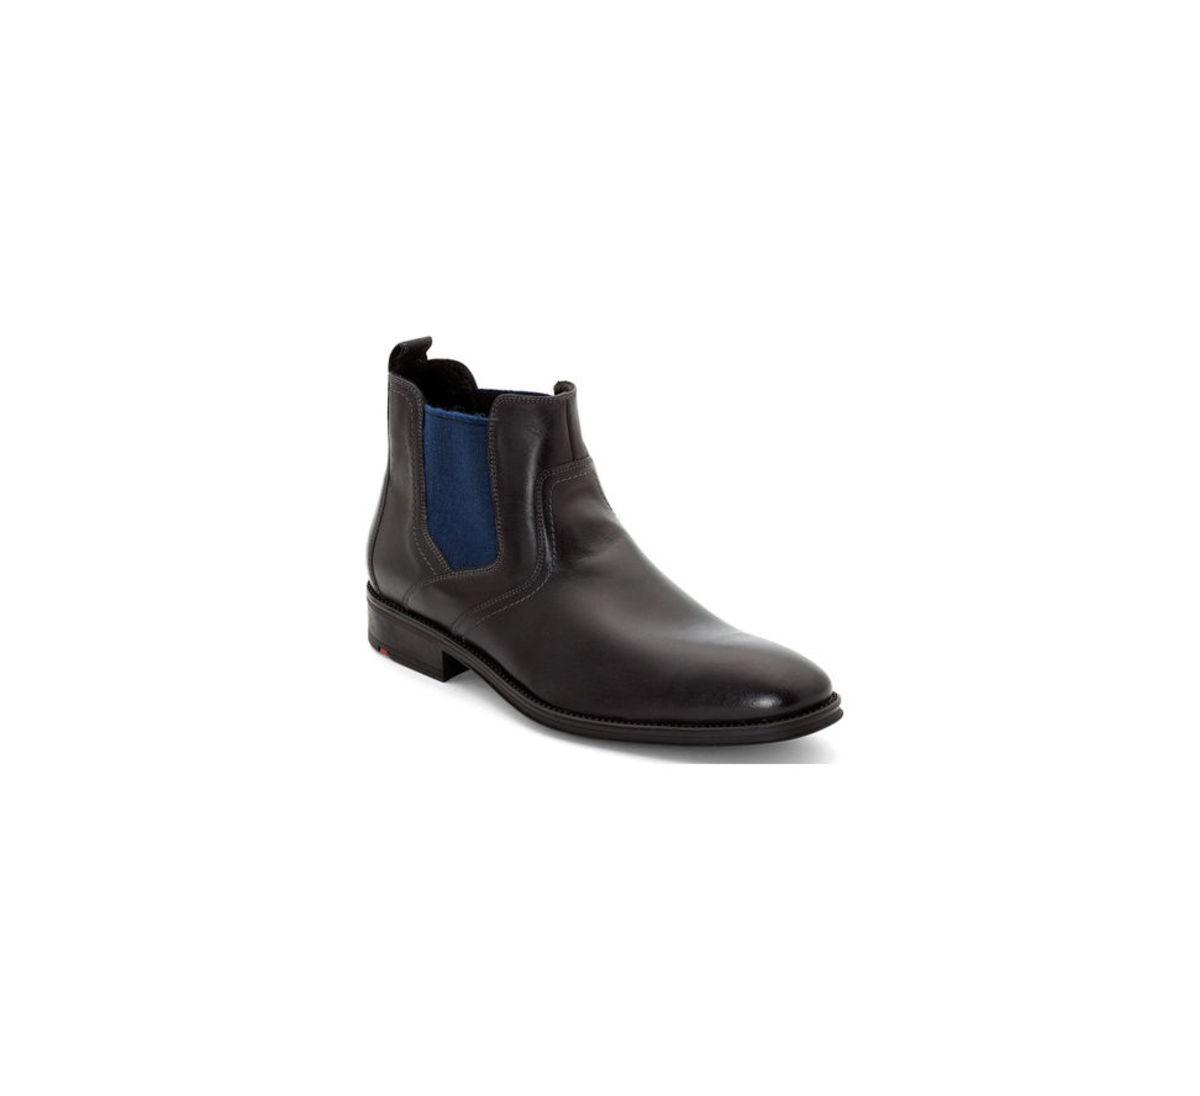 Bild 1 von LLOYD Chelsea-Boots - FABIUS